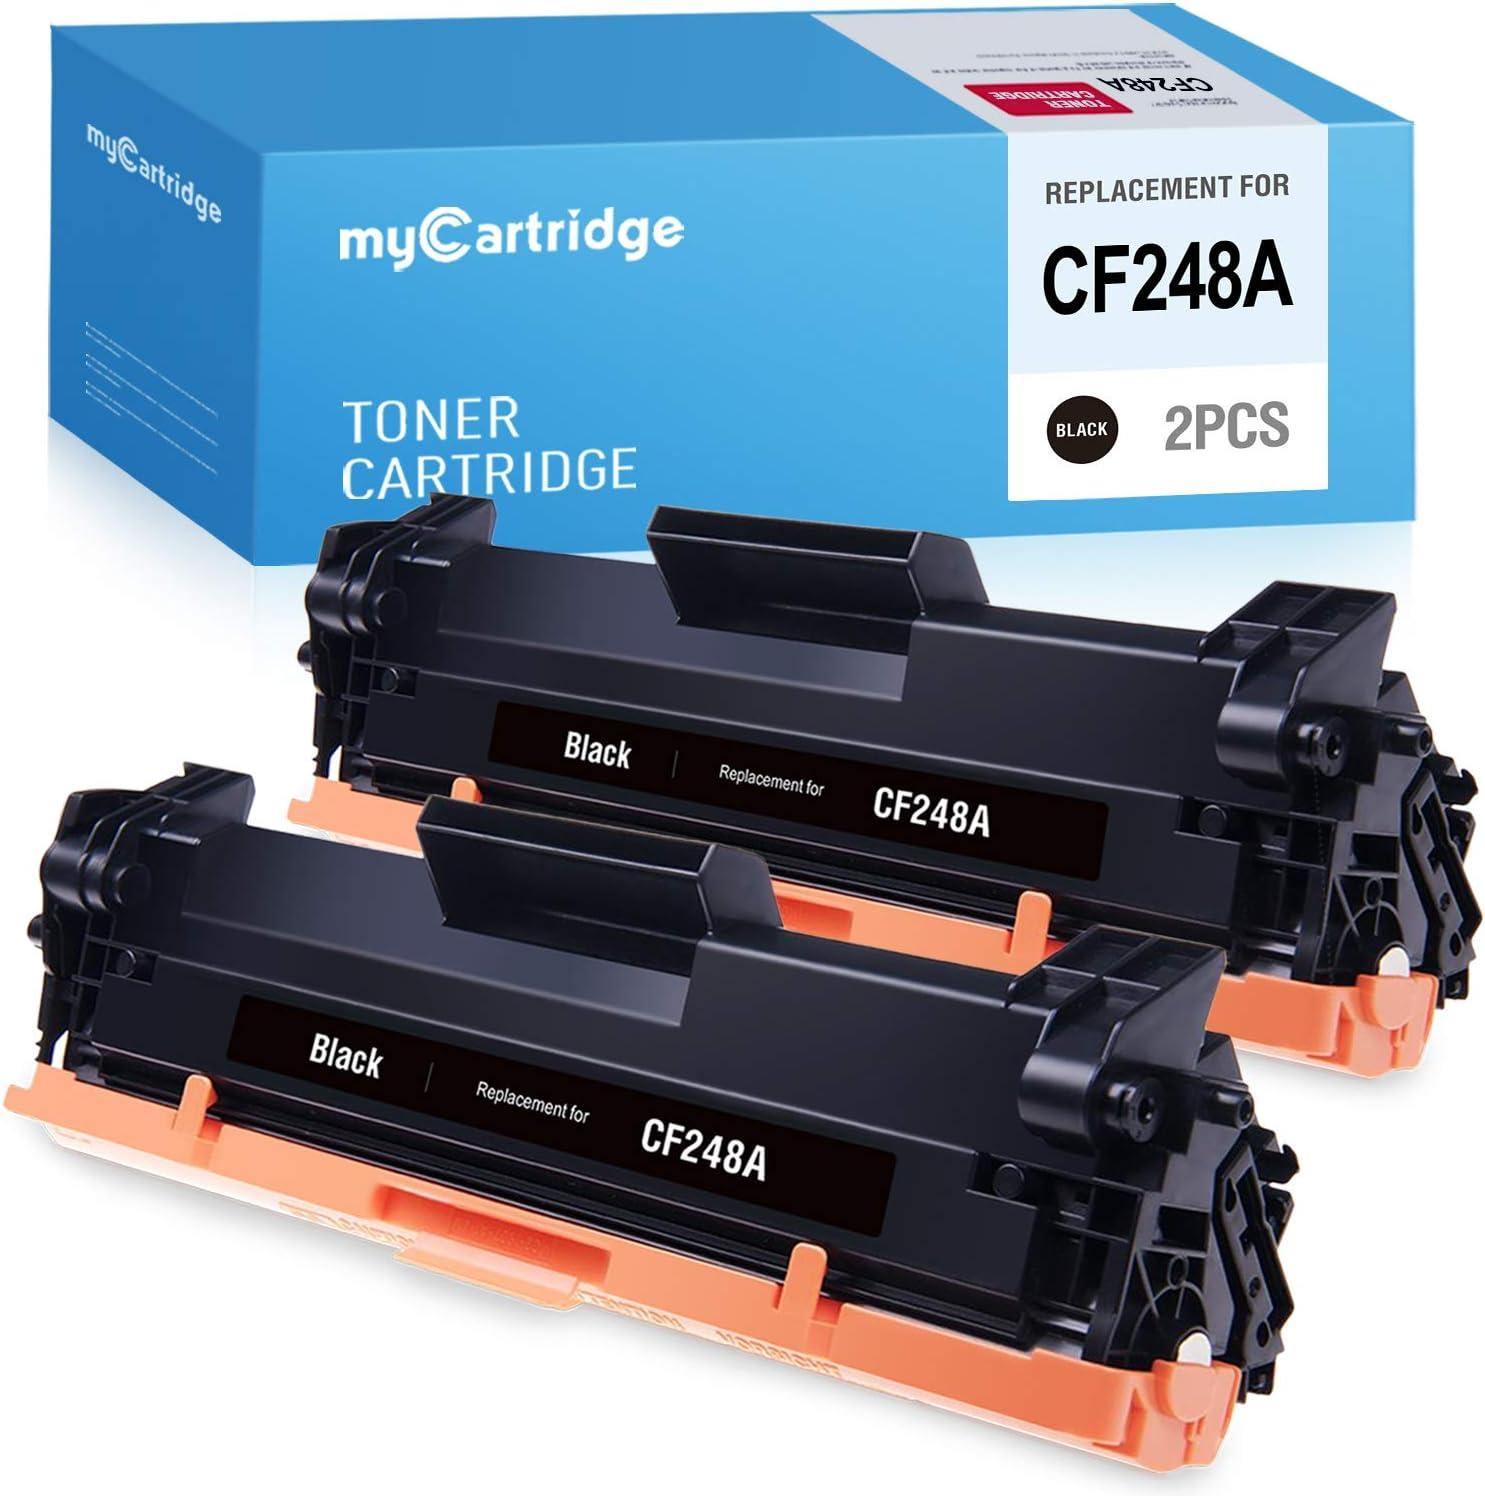 myCartridge Compatible Toner Cartridge Replacement for HP 48A CF248A M28w M15w Laserjet Pro MFP M29w M28a M29a M16a M15a M16w Printer Ink (Black,2-Pack)